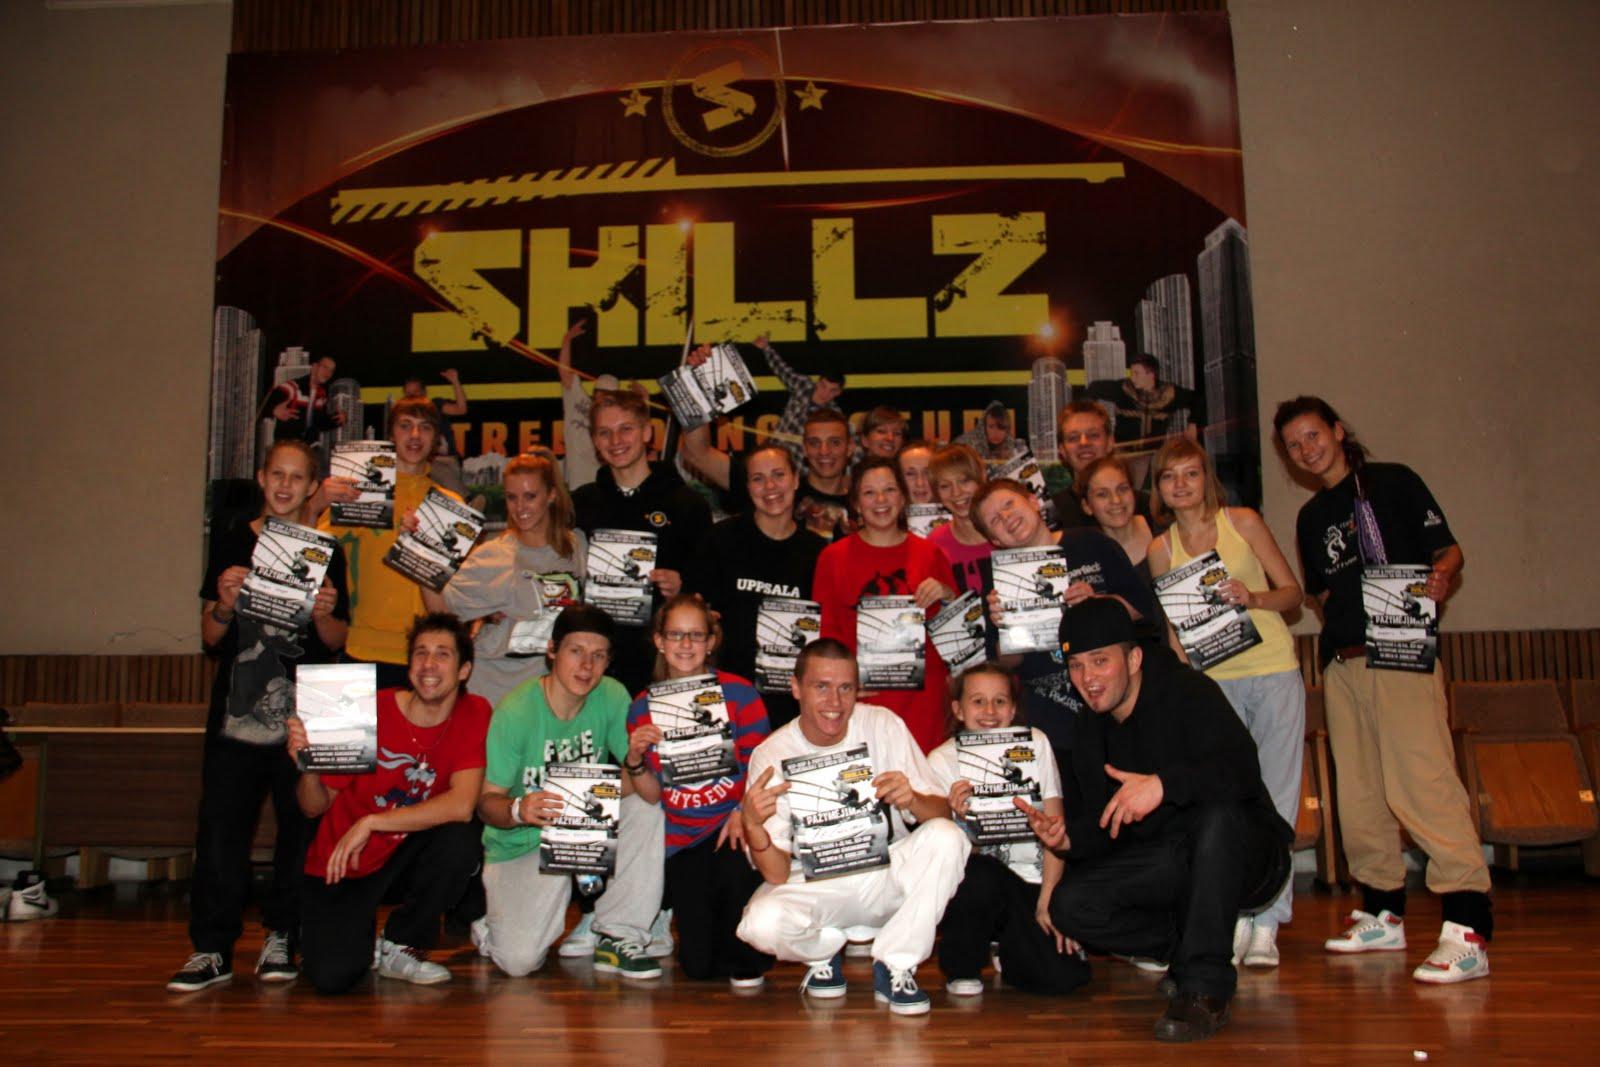 Dre10 Workshop @SKILLZ - IMG_5735.JPG